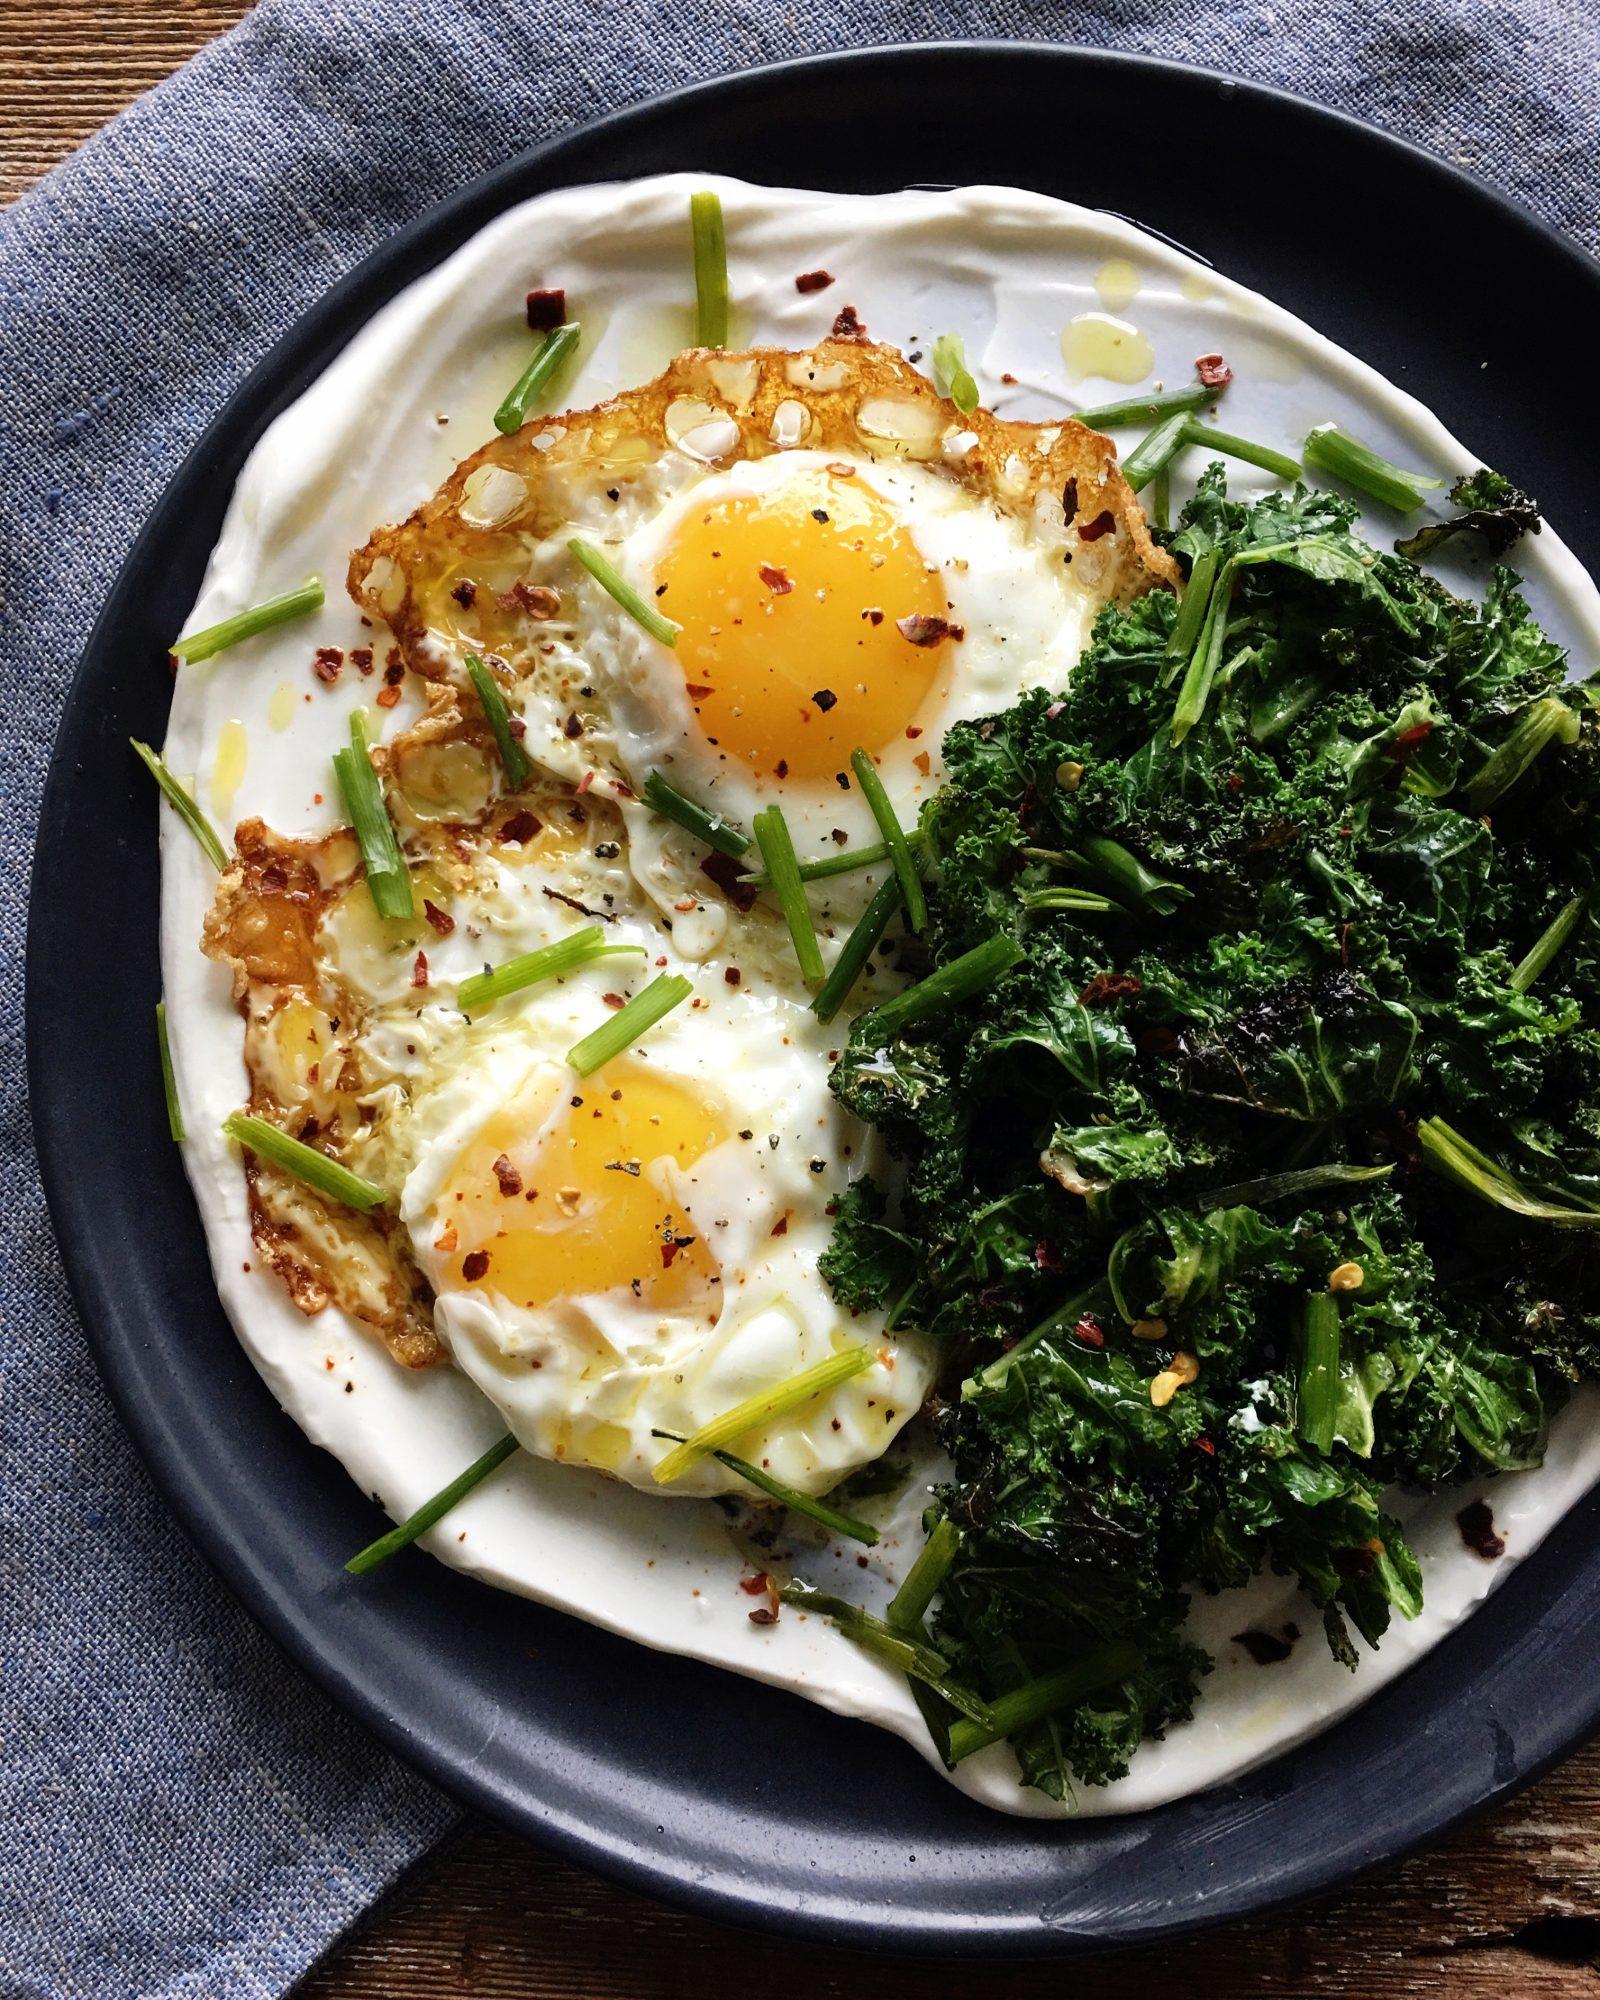 Fried Eggs with yogurt